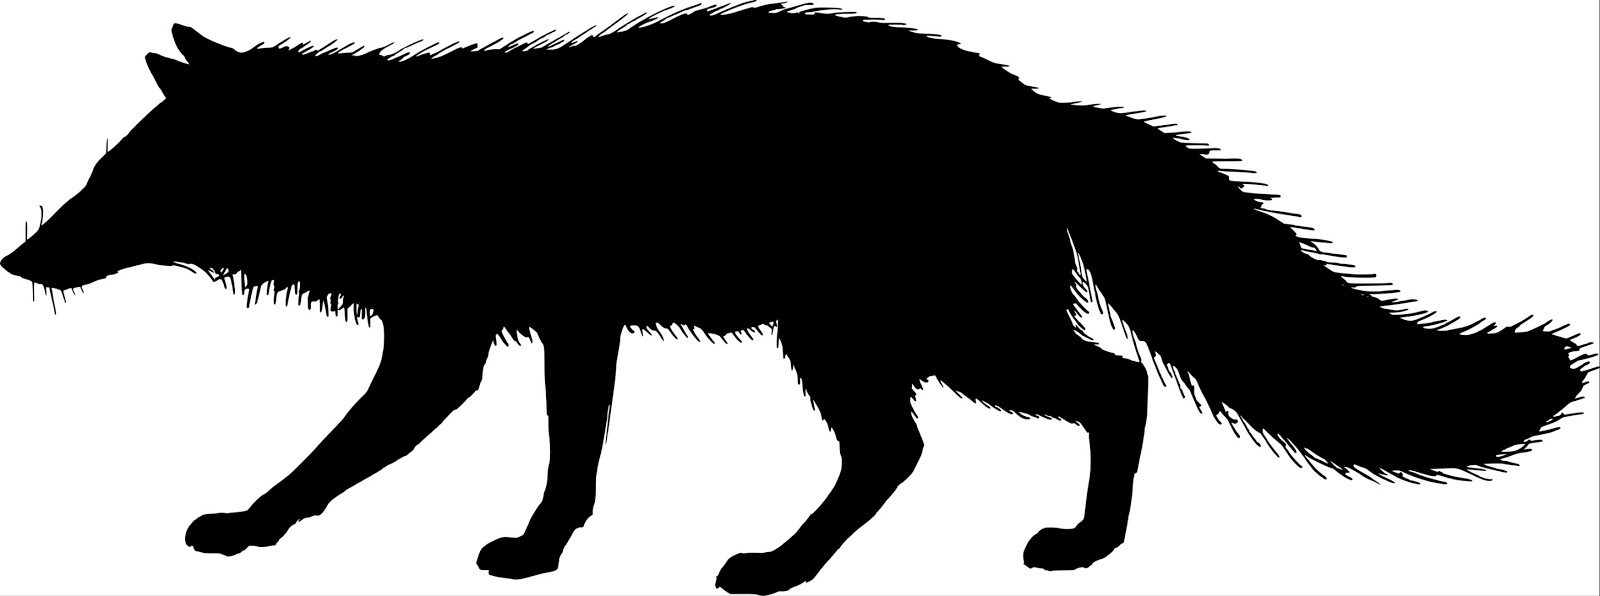 1600x596 Amazing Fox Silhouette Clip Art Running Clipart Panda Free Images